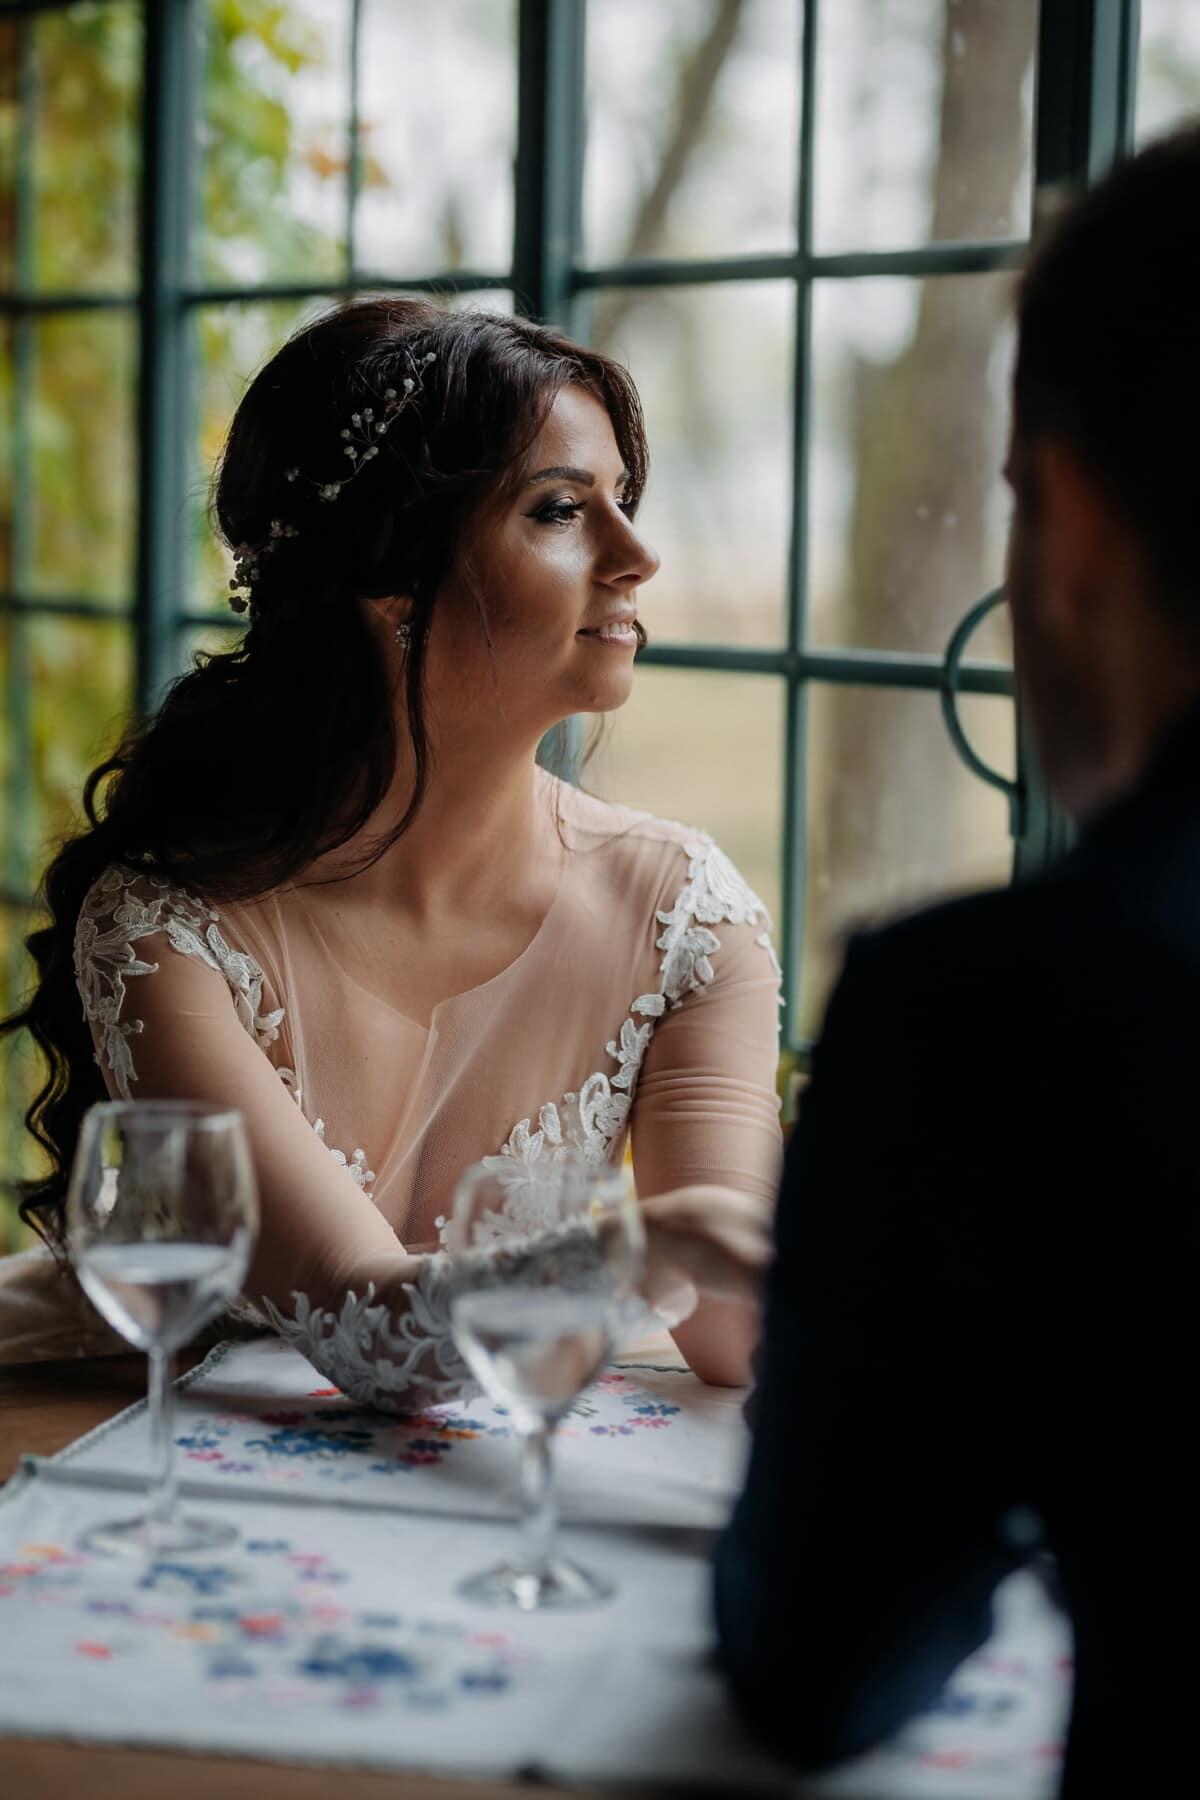 love date, restaurant, pretty girl, gorgeous, romantic, woman, people, portrait, girl, love